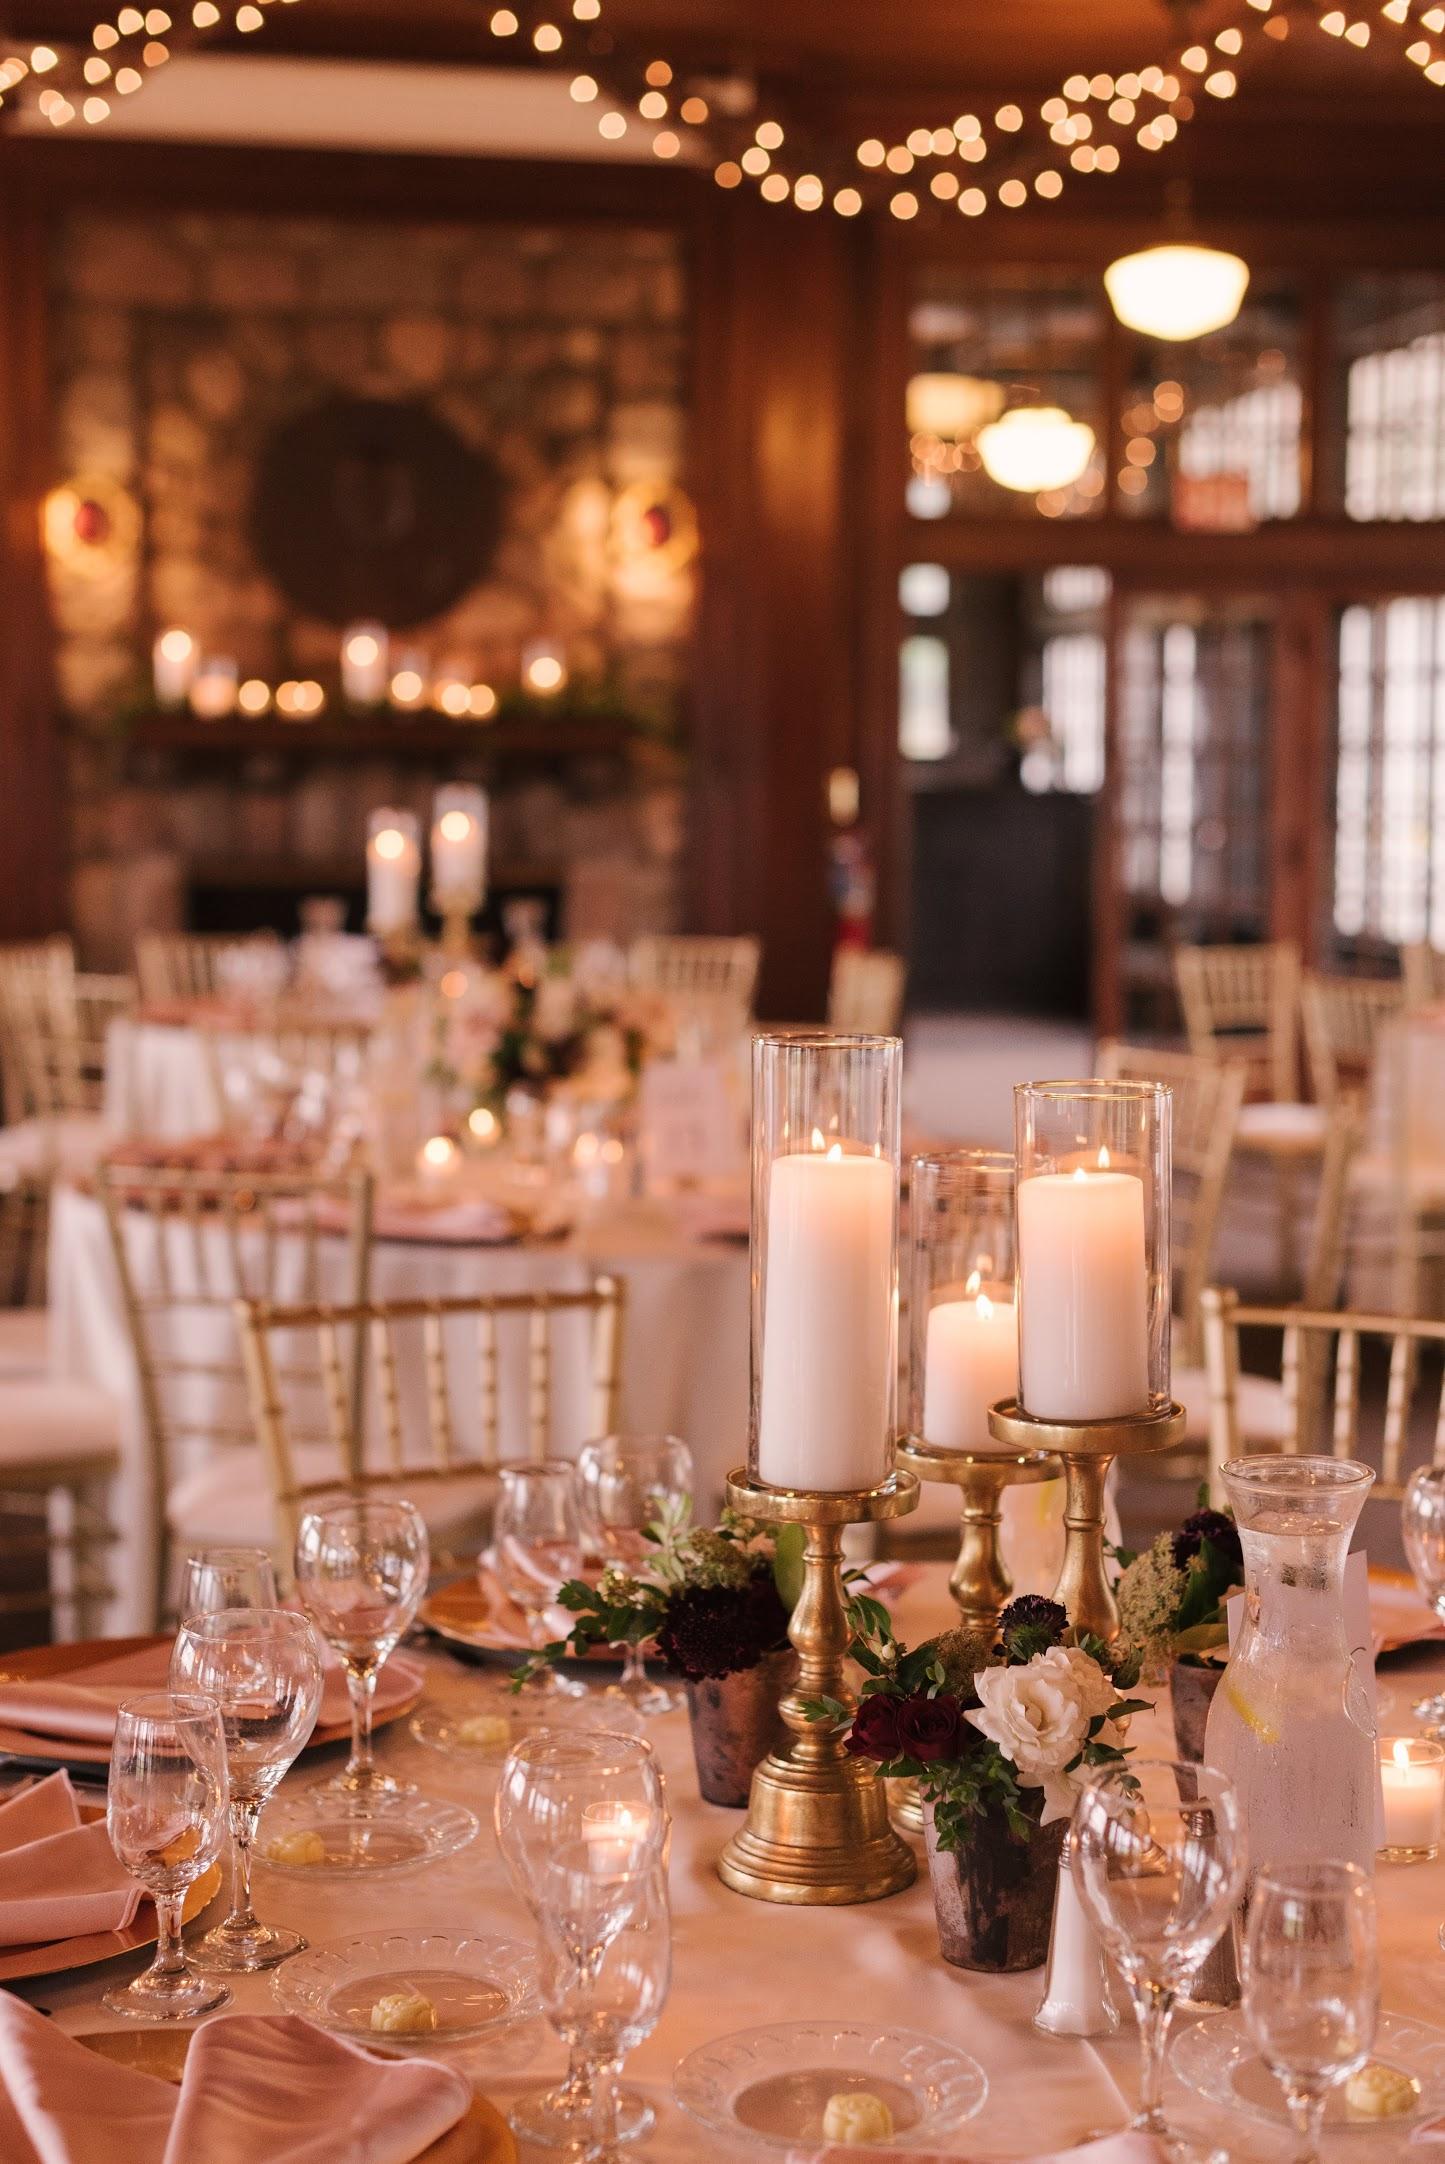 Field-Gems-Photography-Detroit-Michigan-Wedding-Photographer-Family-Photographer-Photobooth-090818-880.jpg